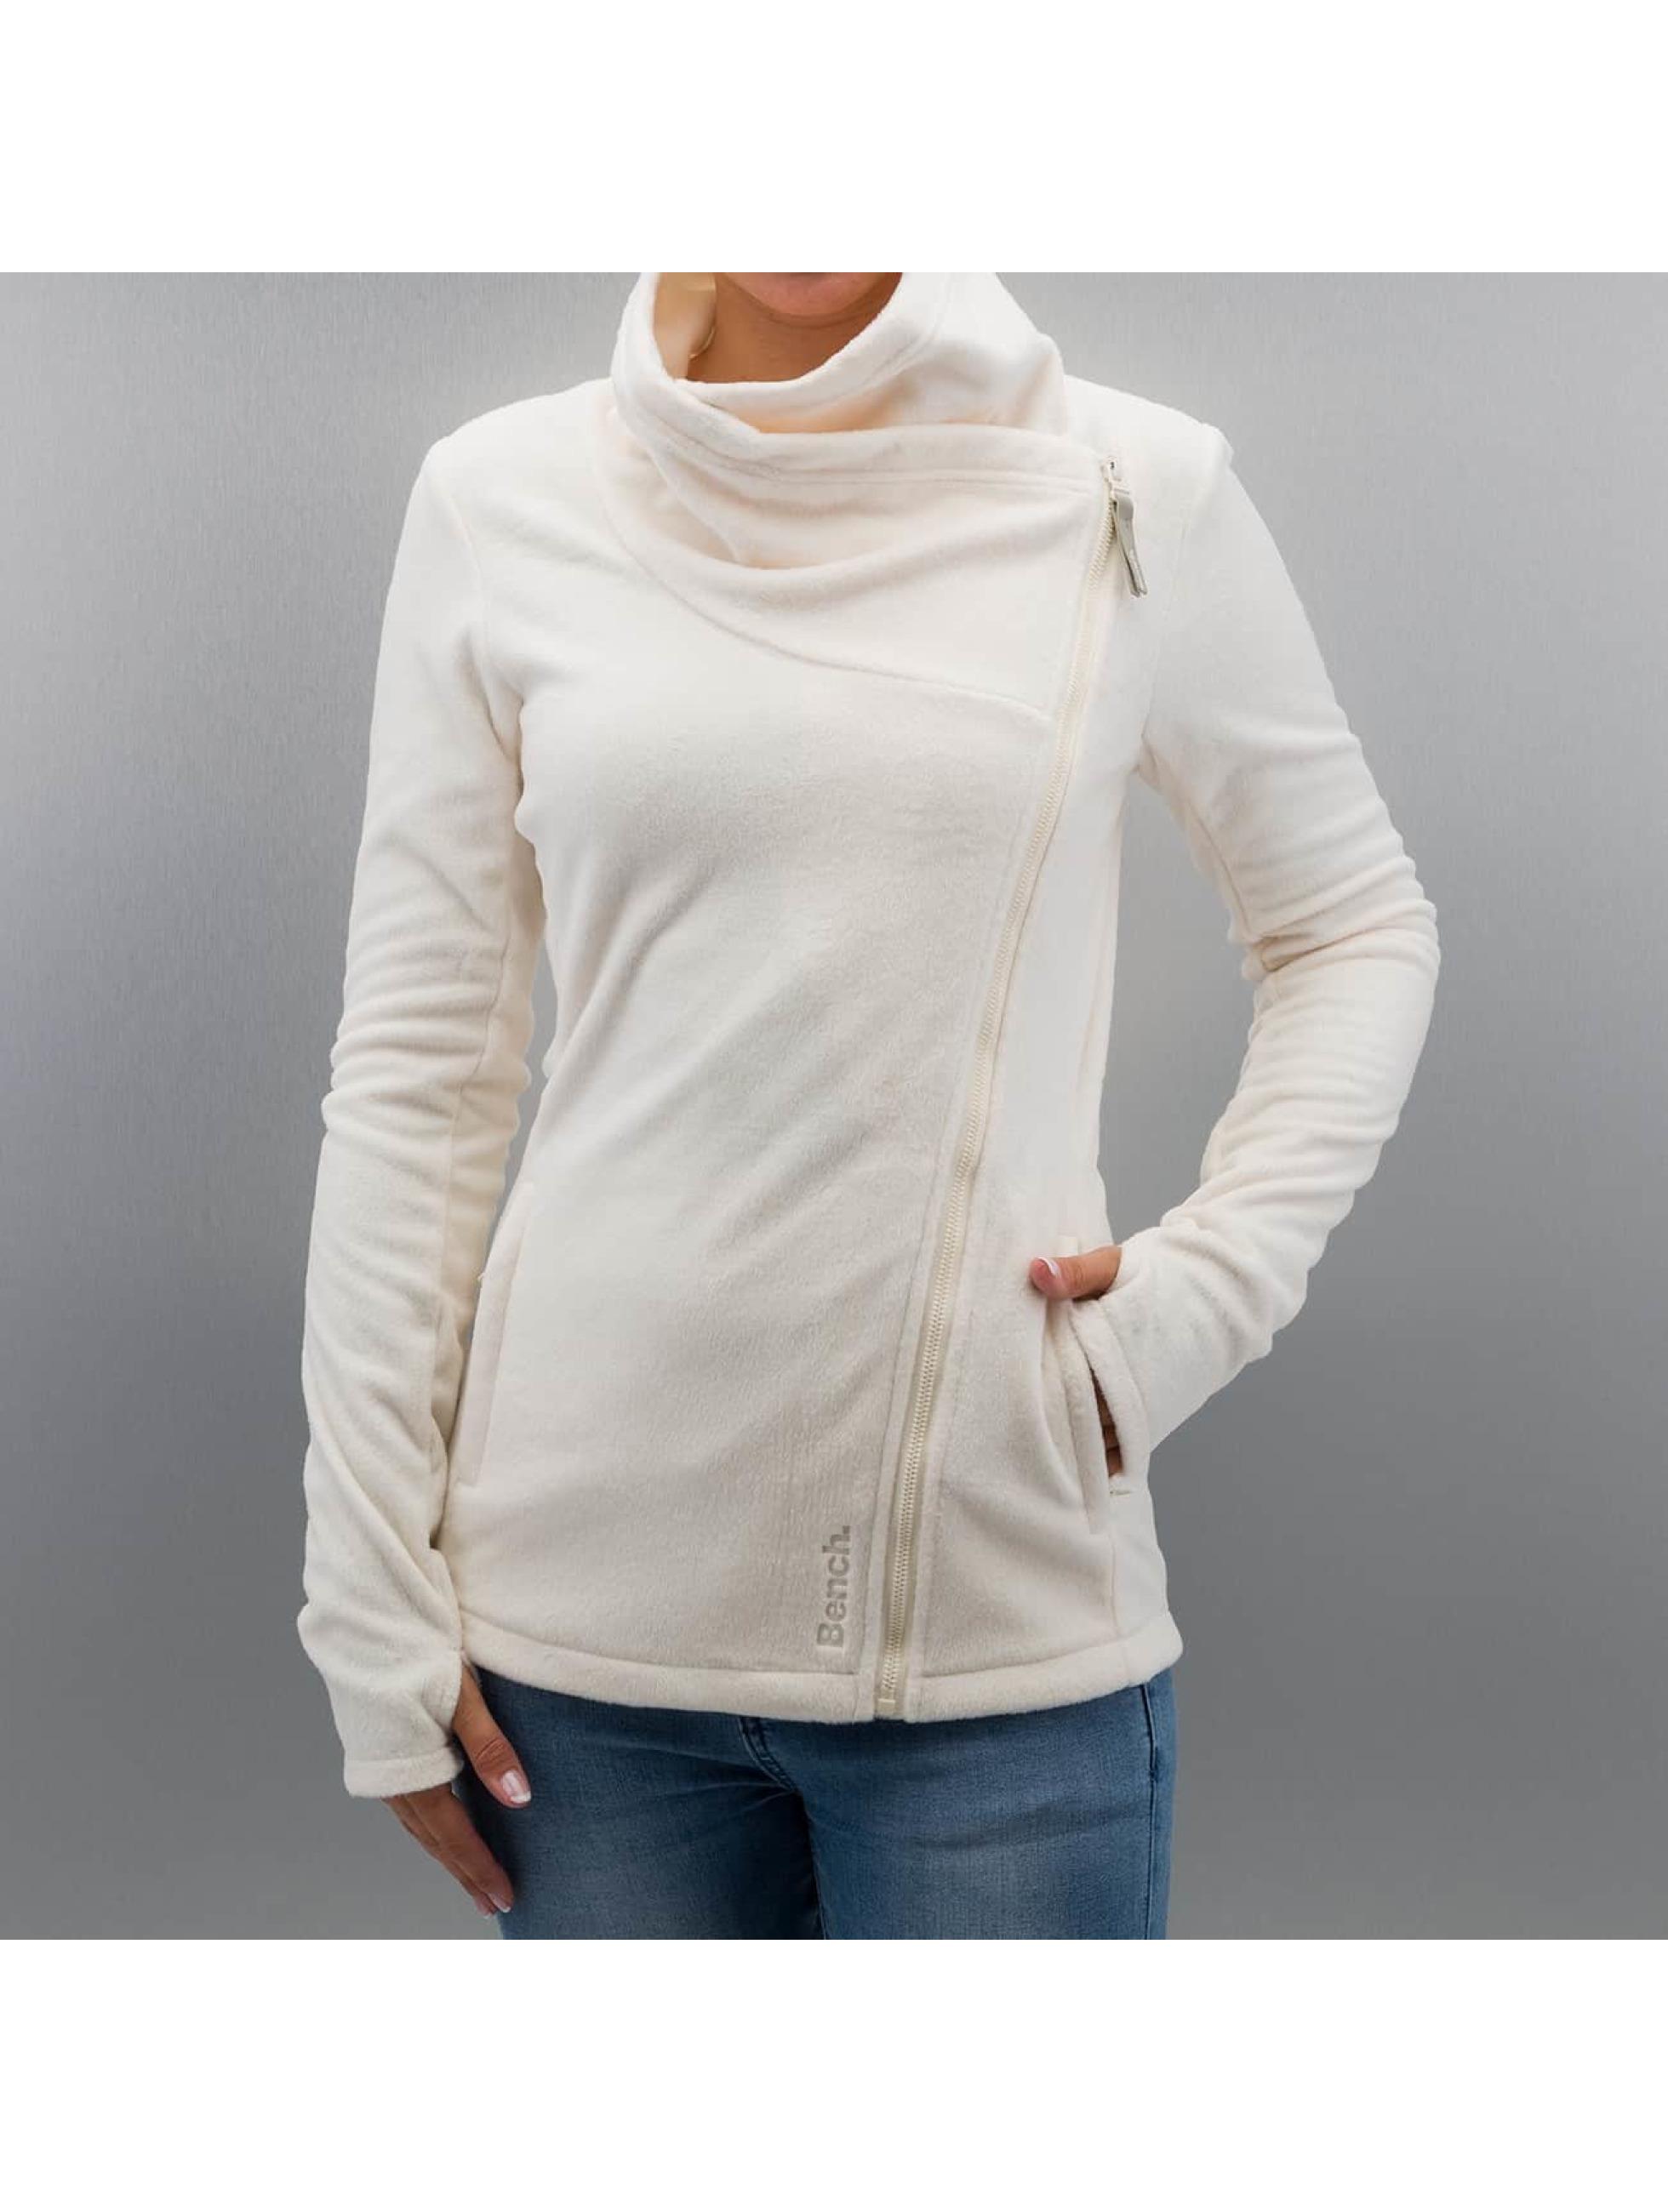 Bench Демисезонная куртка Riskrunner B Fleece Jacket бежевый